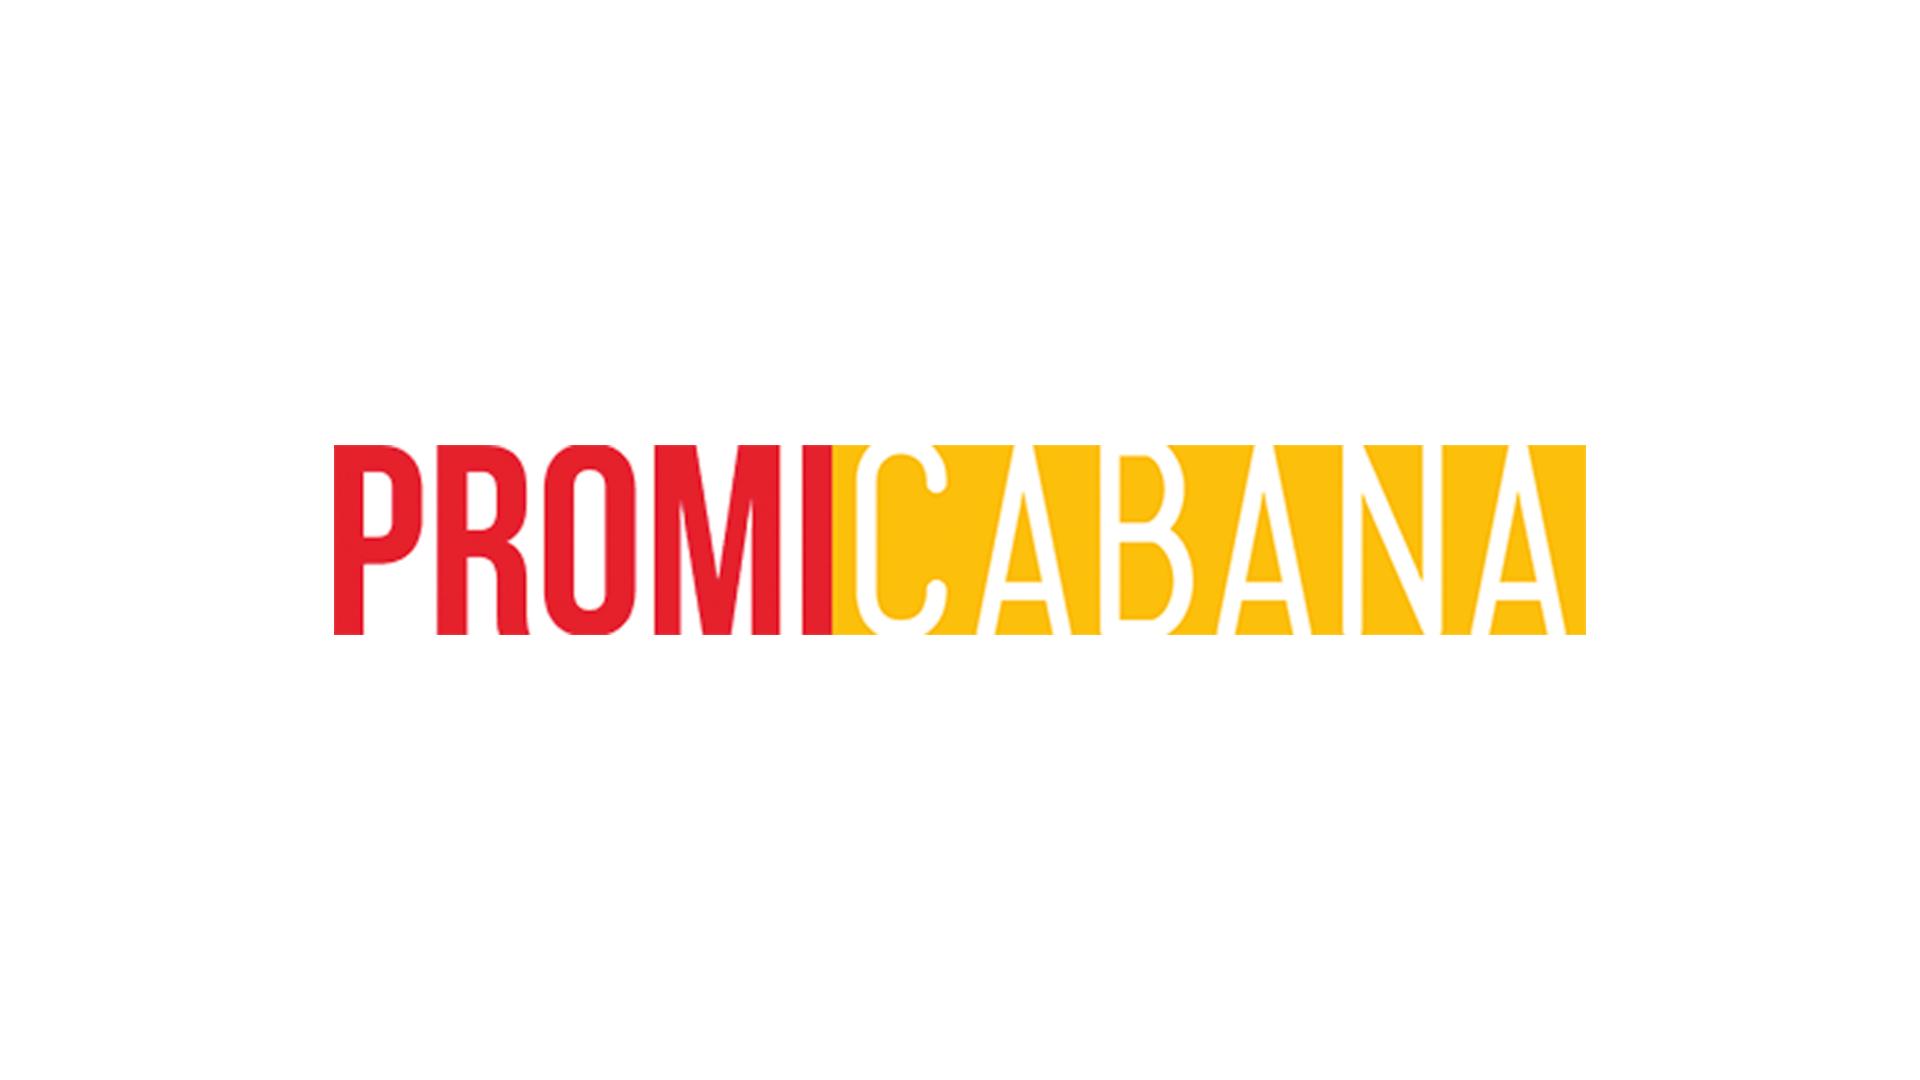 Need-For-Speed-Trailer-Aaron-Paul